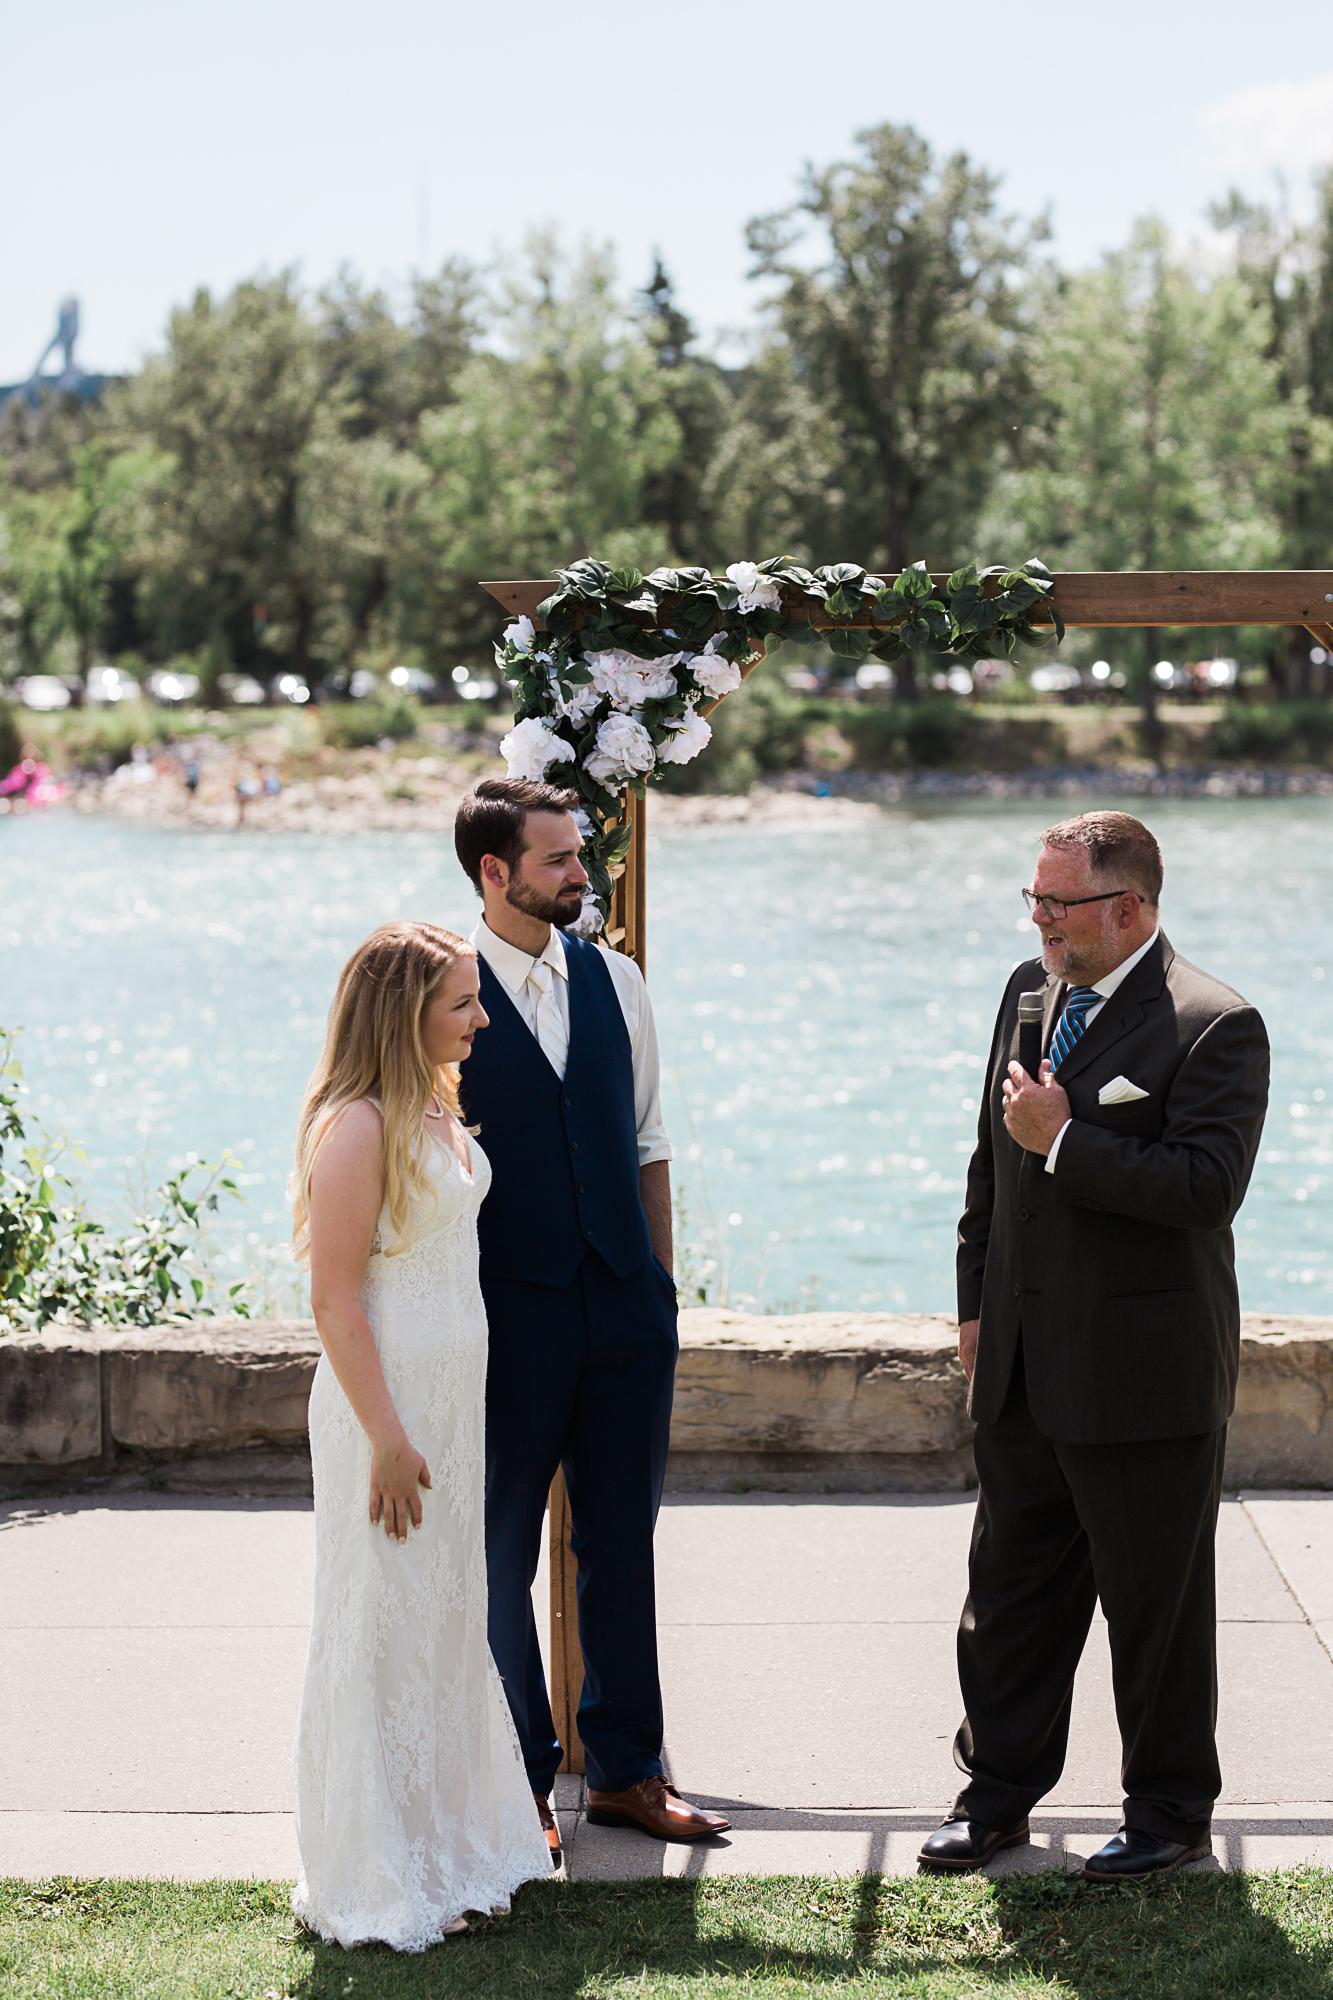 Baker-park-wedding-AC-38.jpg